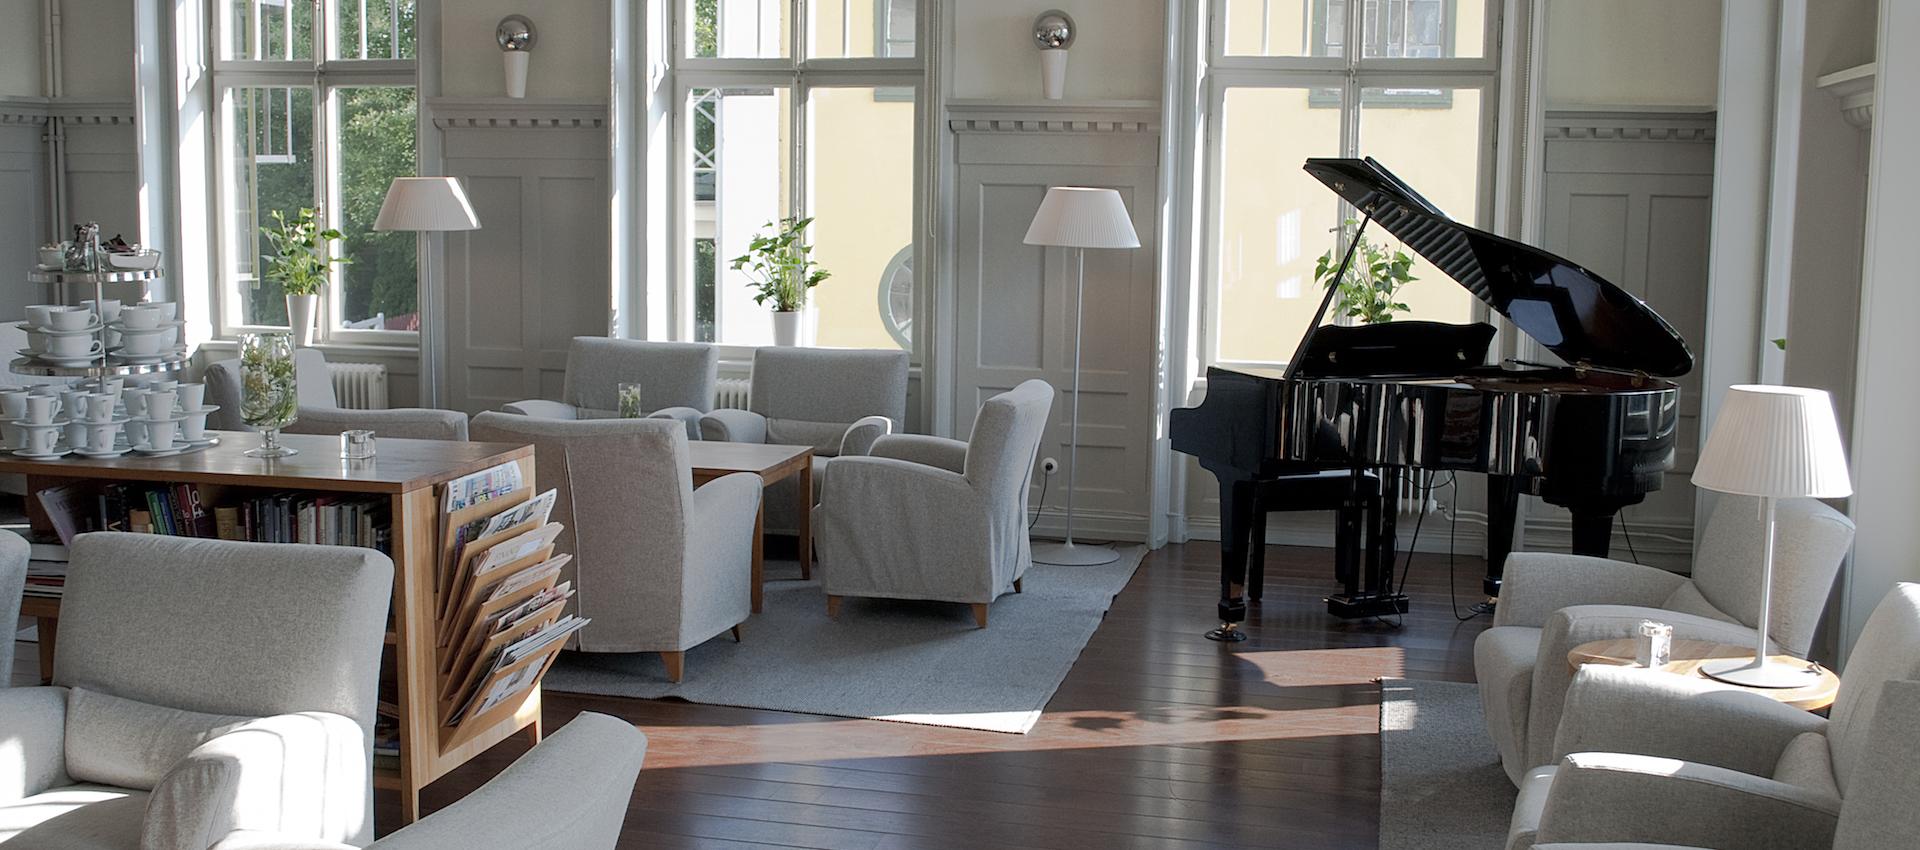 Lounge_oversikt_1920x850